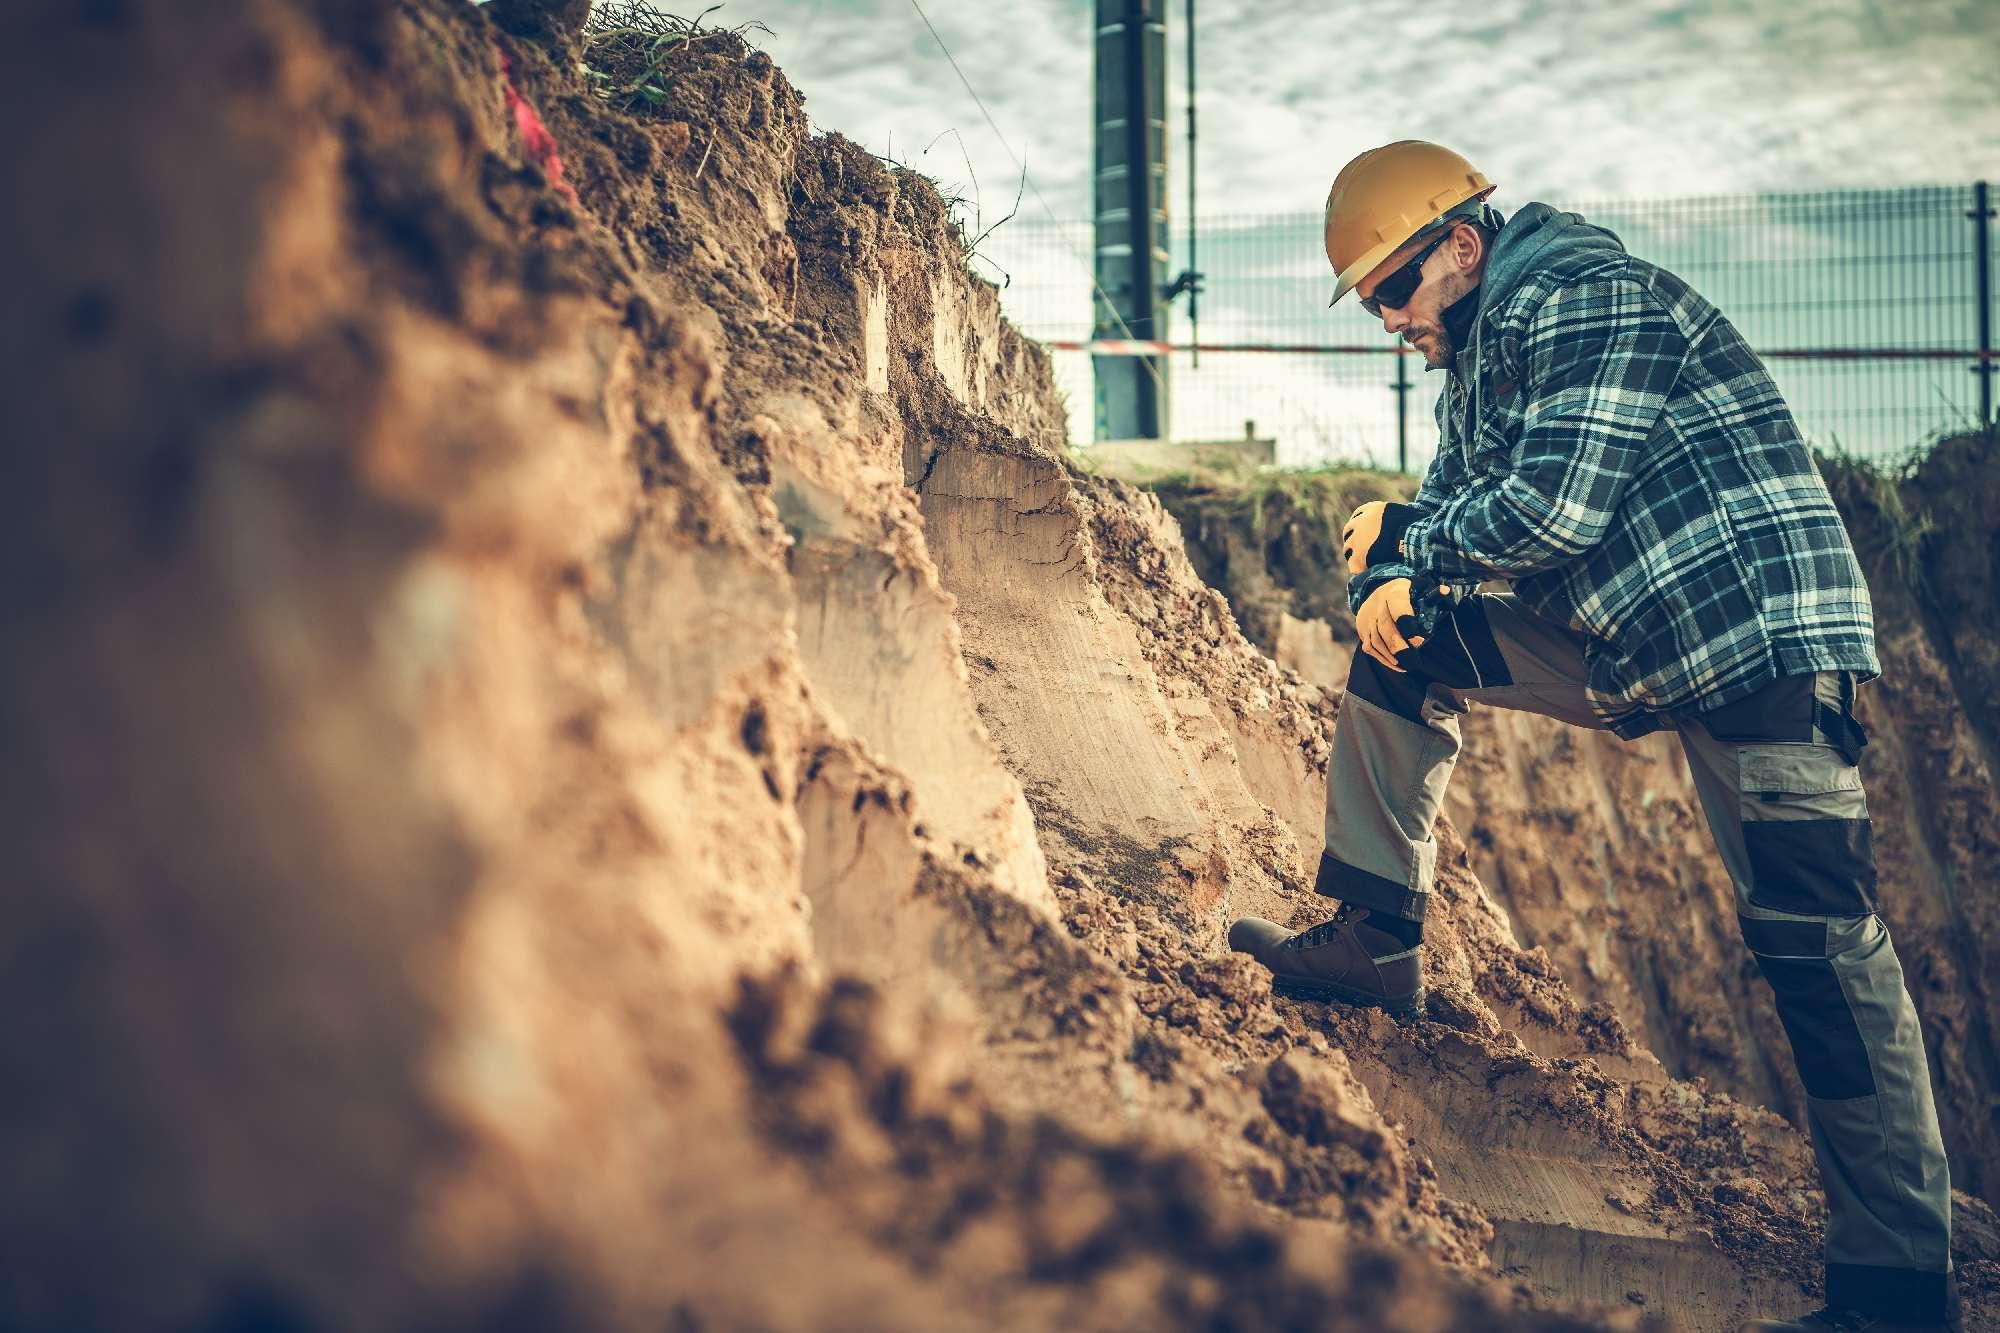 Геология и проучване на минерални и енергийни ресурси